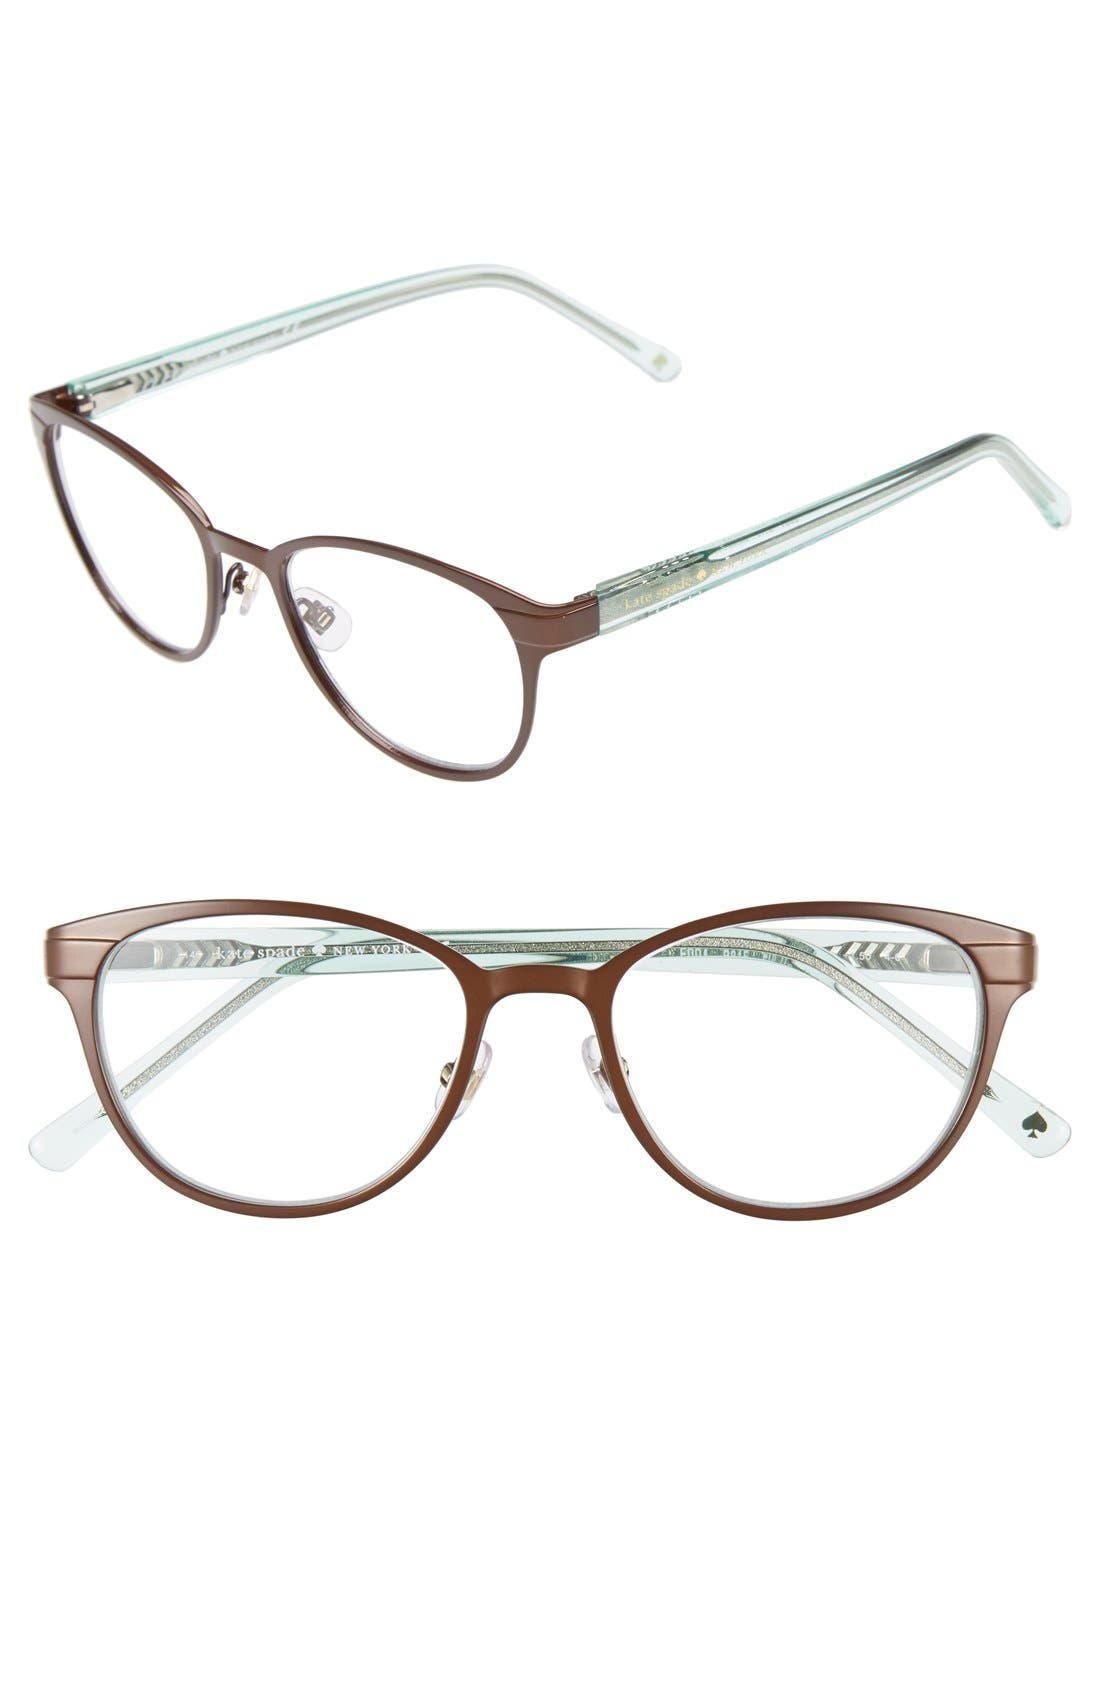 Main Image - kate spade new york 'ebba' 50mm reading glasses